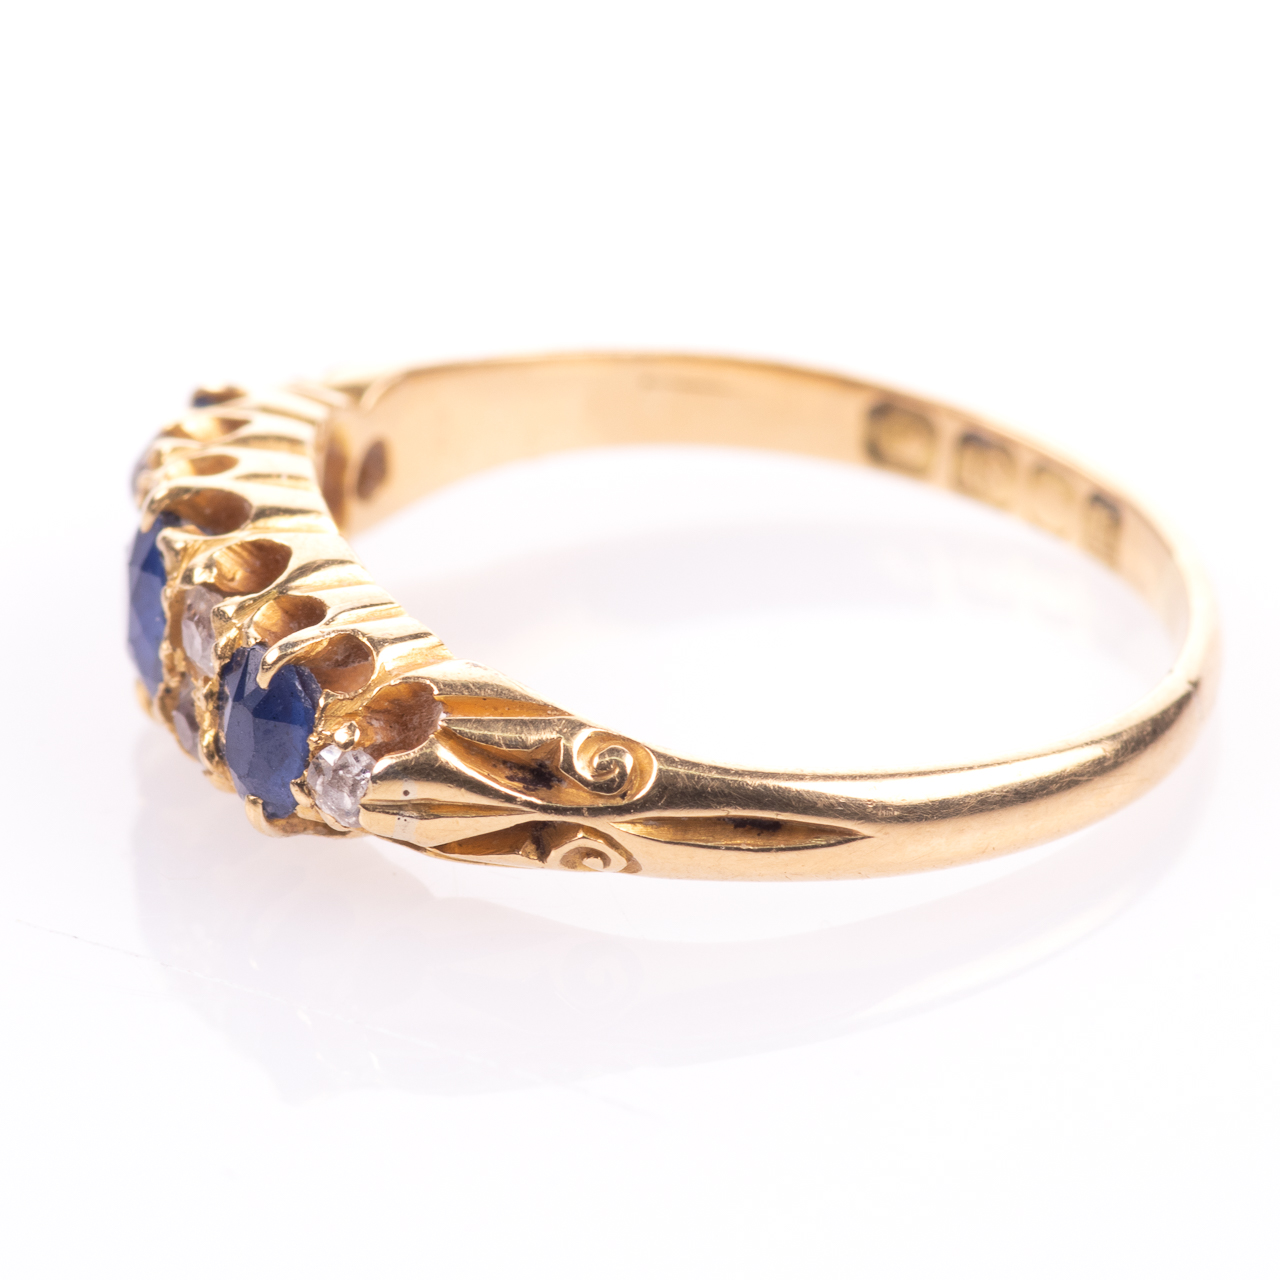 18ct Gold George V 1ct Sapphire & Diamond Ring London 1908 - Image 5 of 7